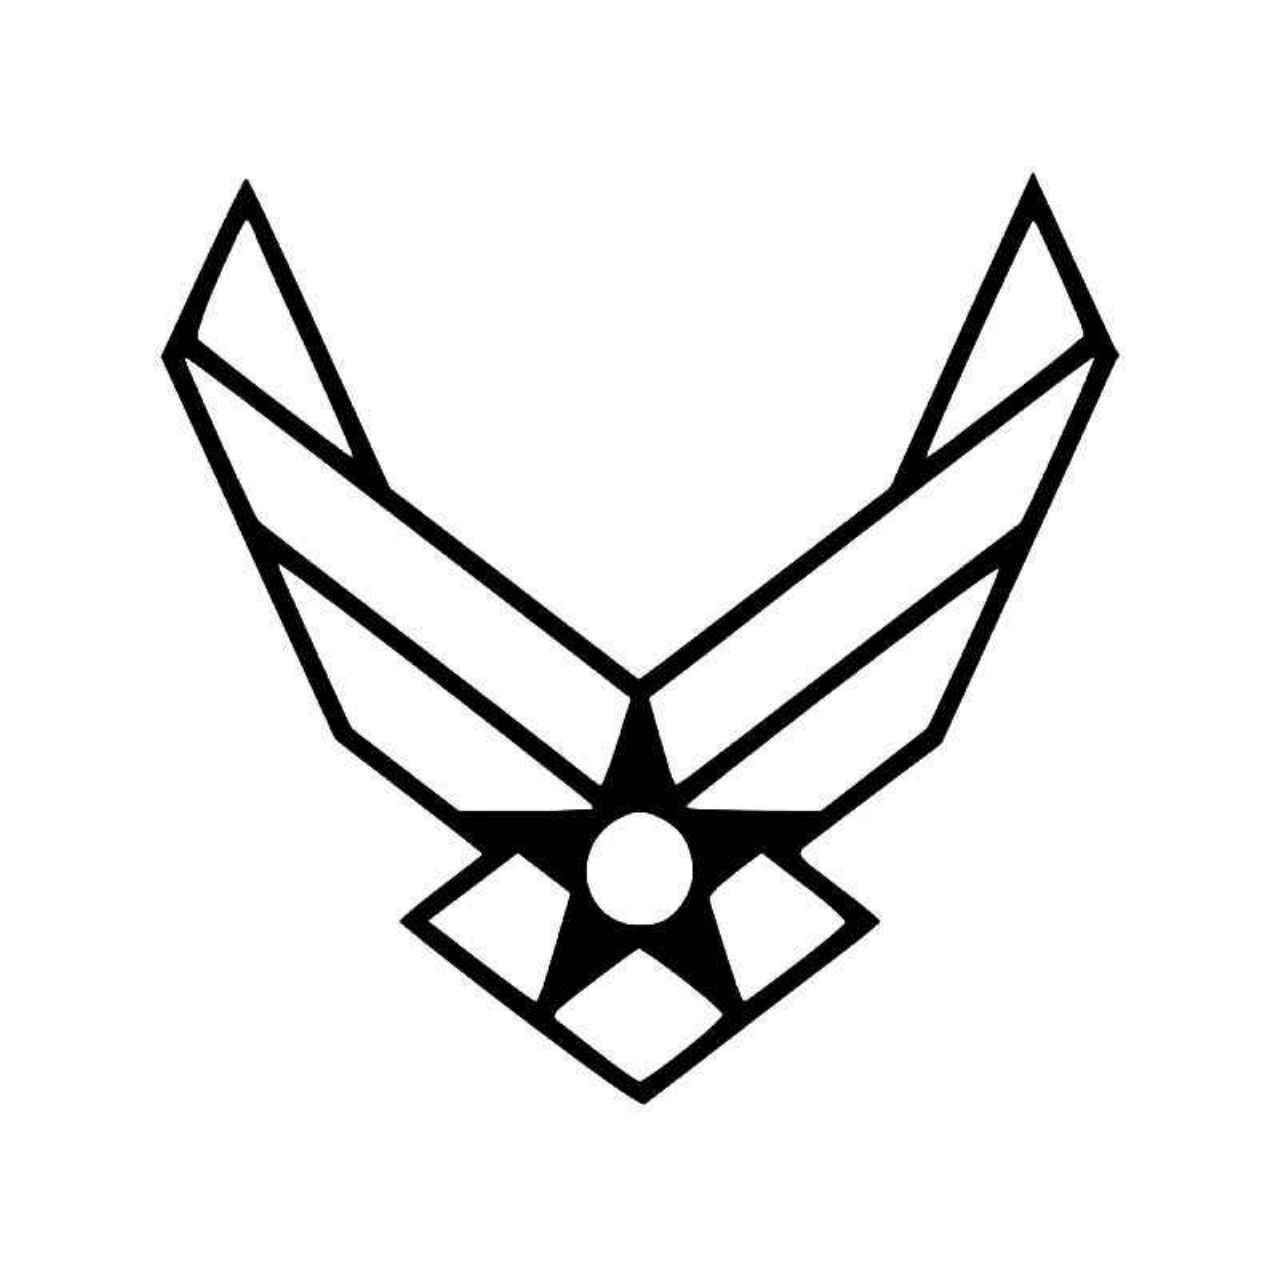 U S Air Force Insignia Badge Vinyl Decal Sticker